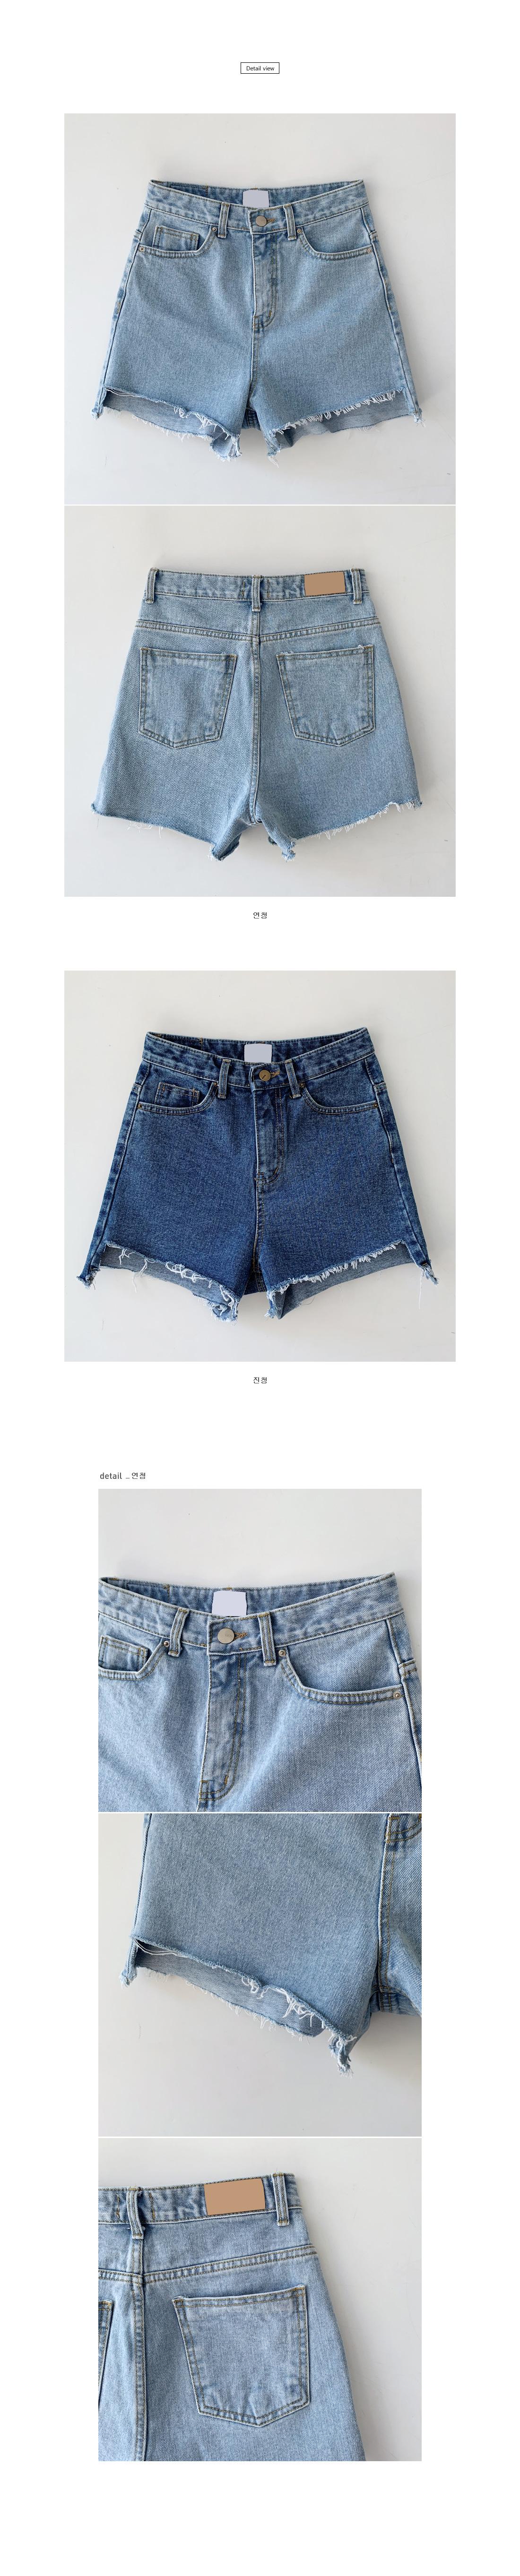 Vitamin Unbald Blue Shorts- Dark Blue S, Light Blue XL Same day delivery